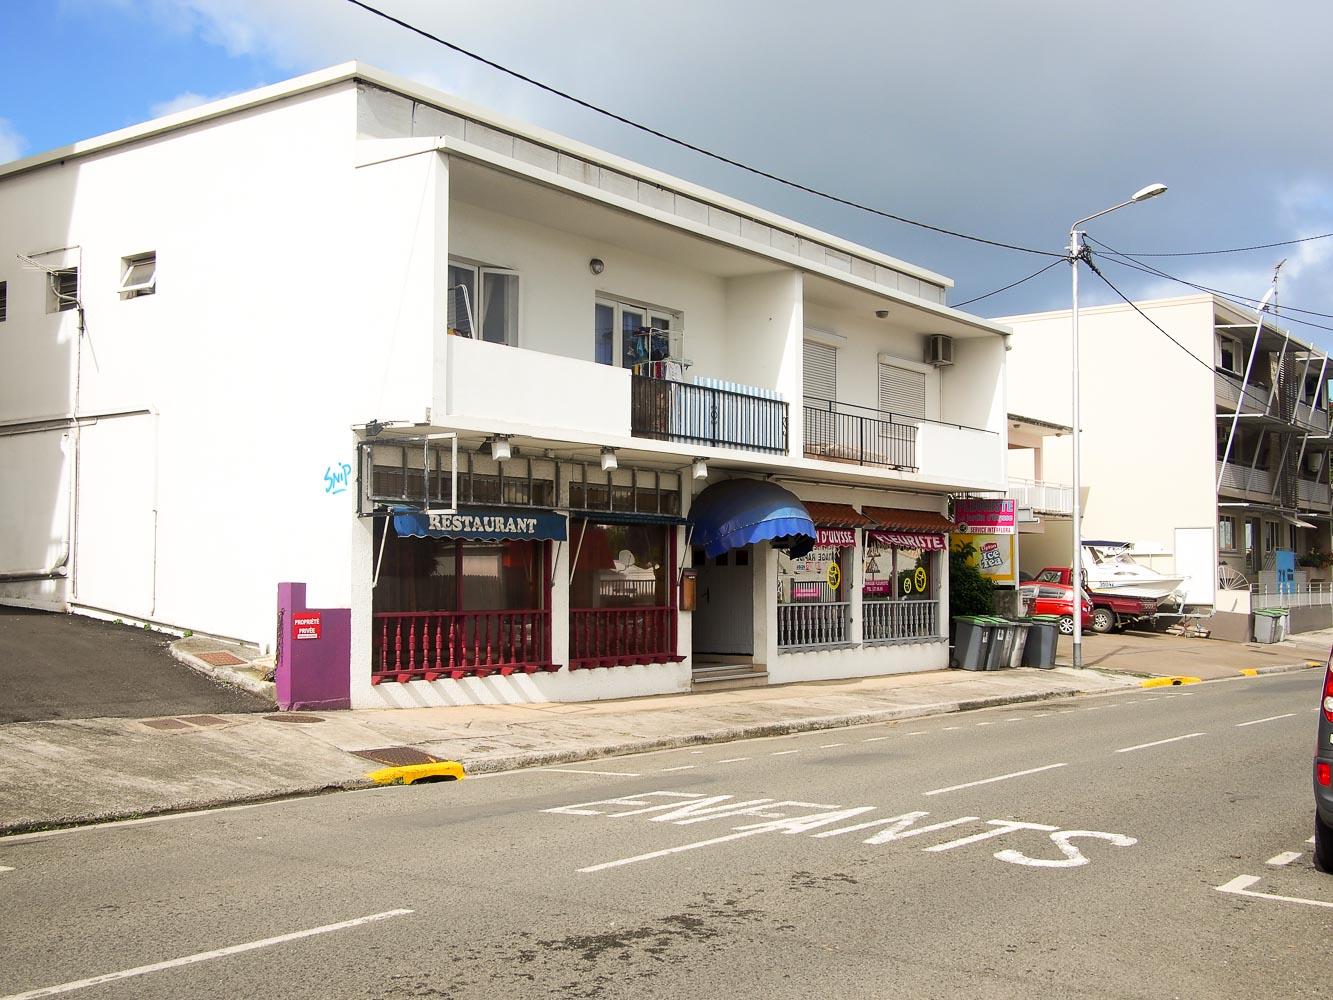 B kyu restaurant l 39 arlequin french noumea for Azeri cuisine caledonian road